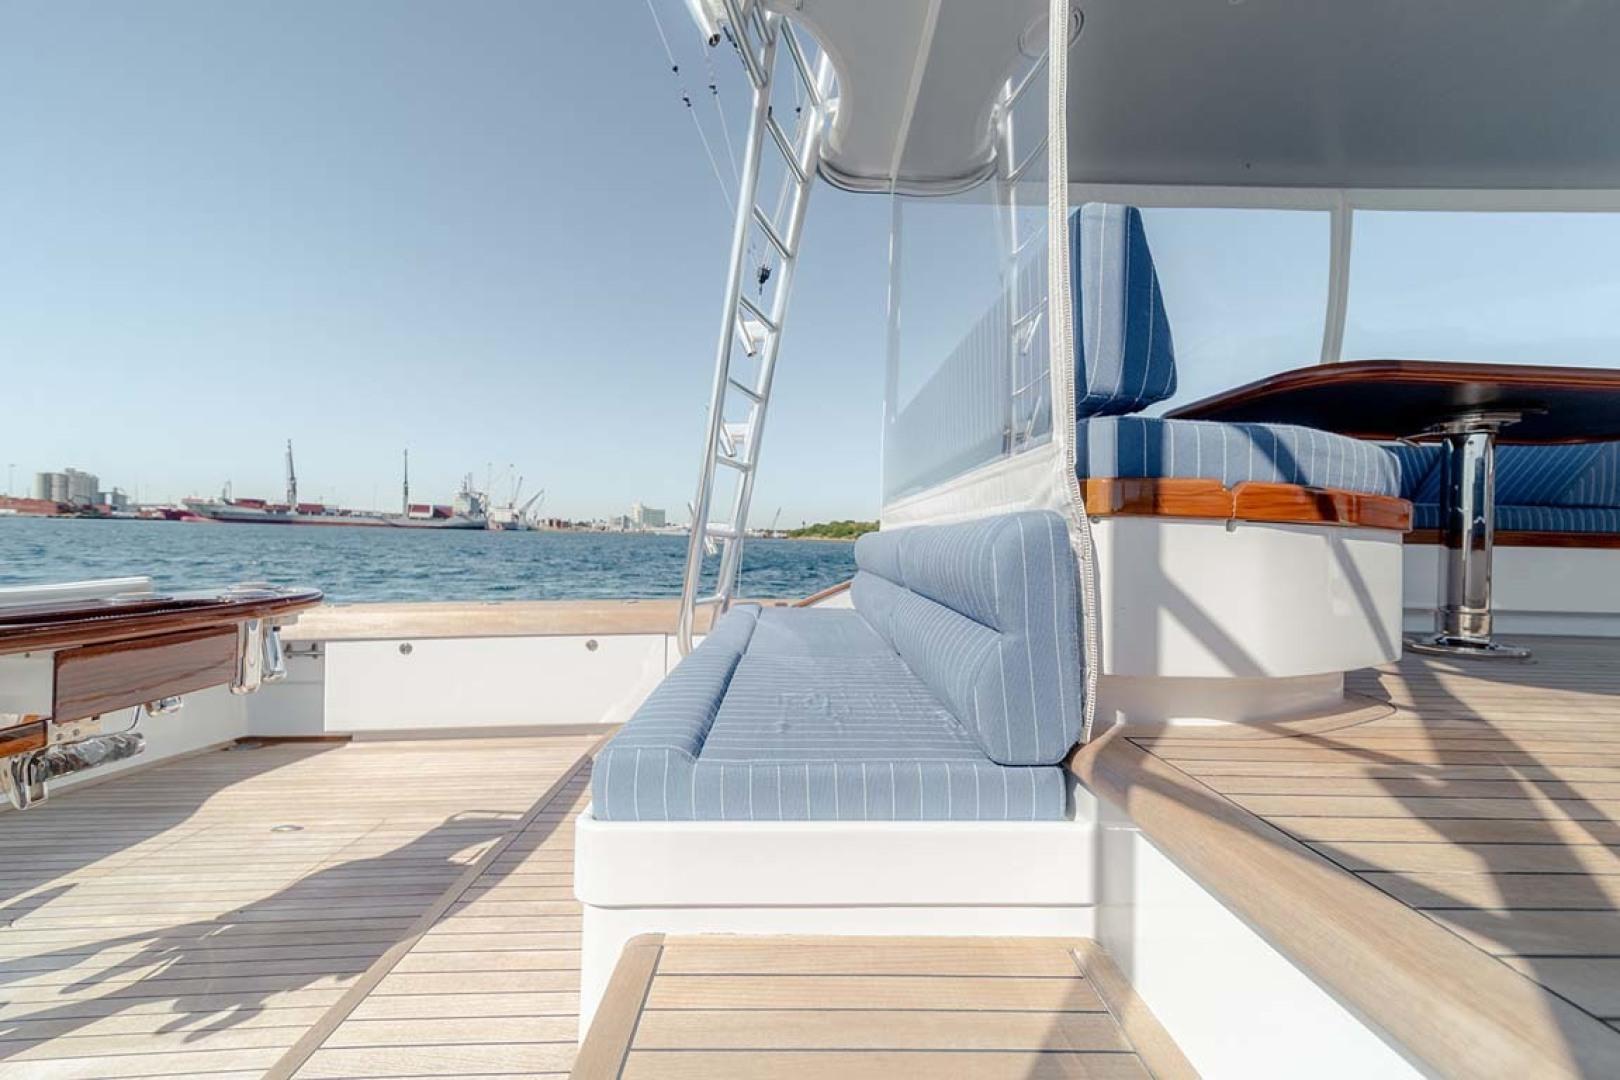 Jim Smith-Walkaround Express 2018-Eurybia North Palm Beach-Florida-United States-Mezzanine Seating with Storage and Refrigeration-1573749   Thumbnail